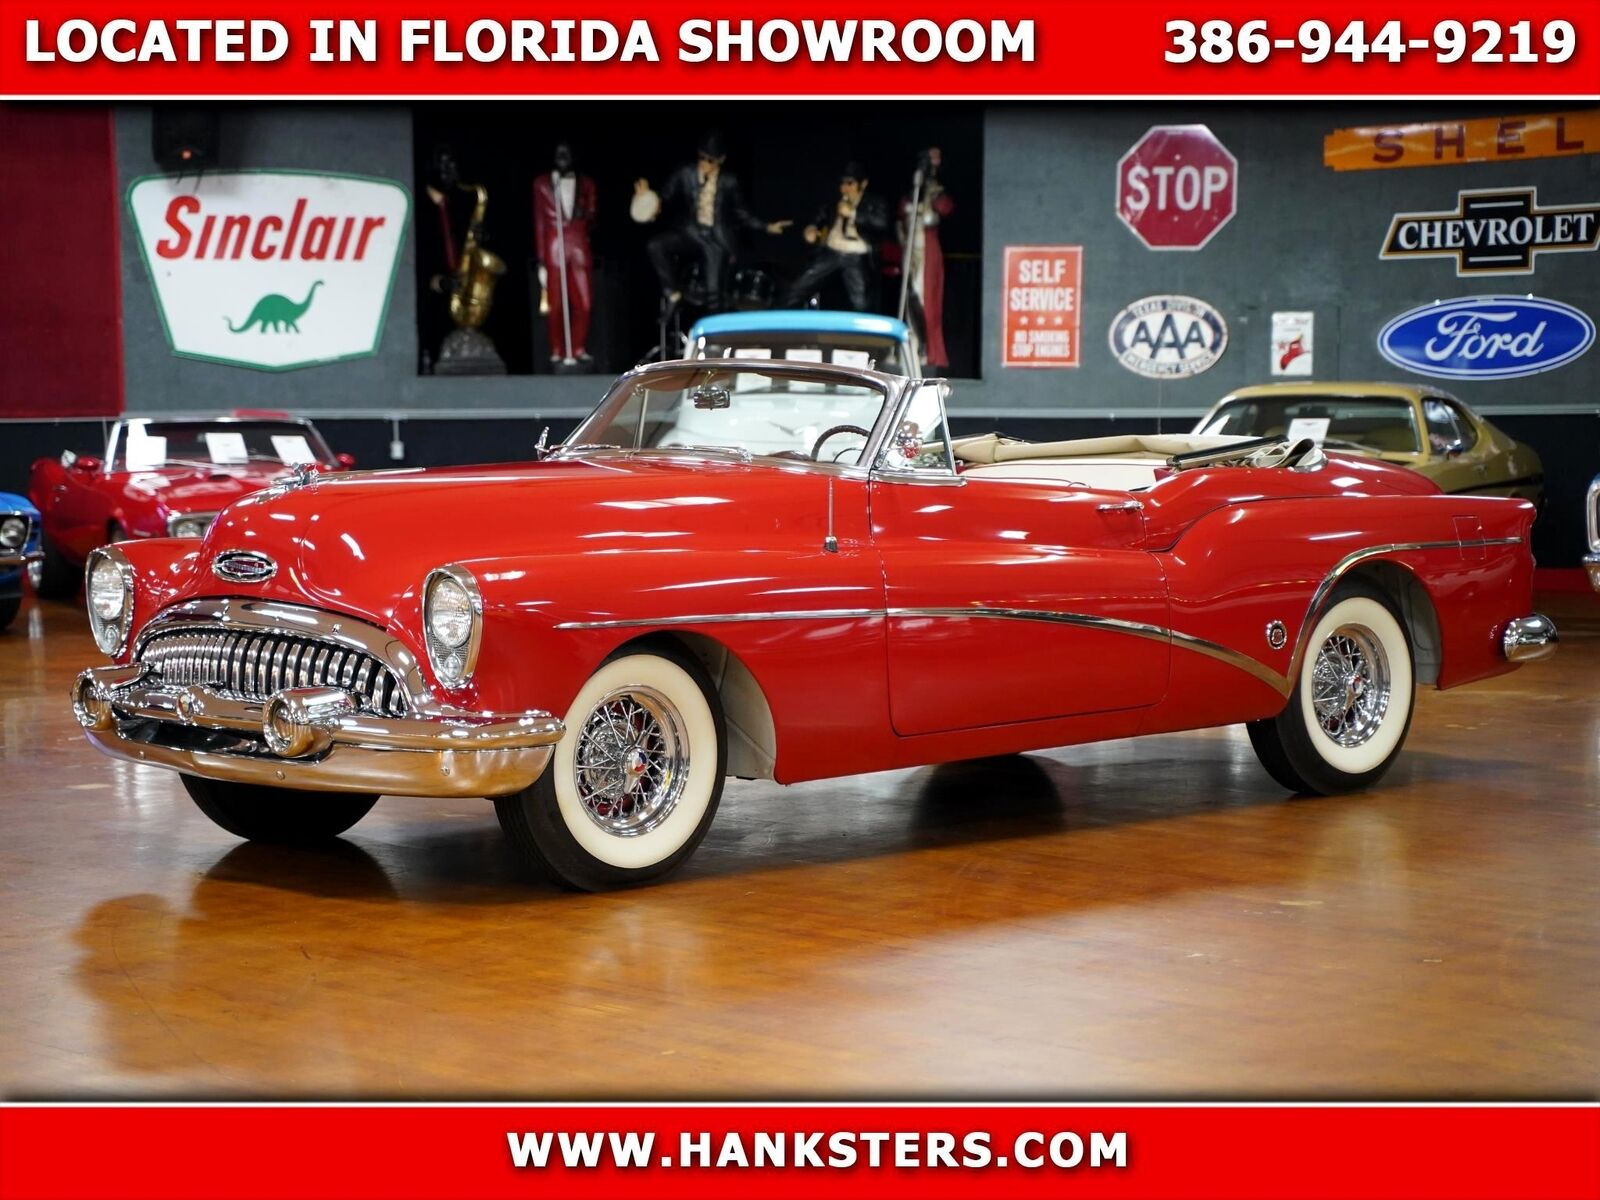 1953 Buick Skylark Roadmaster (Used - 149900 USD)